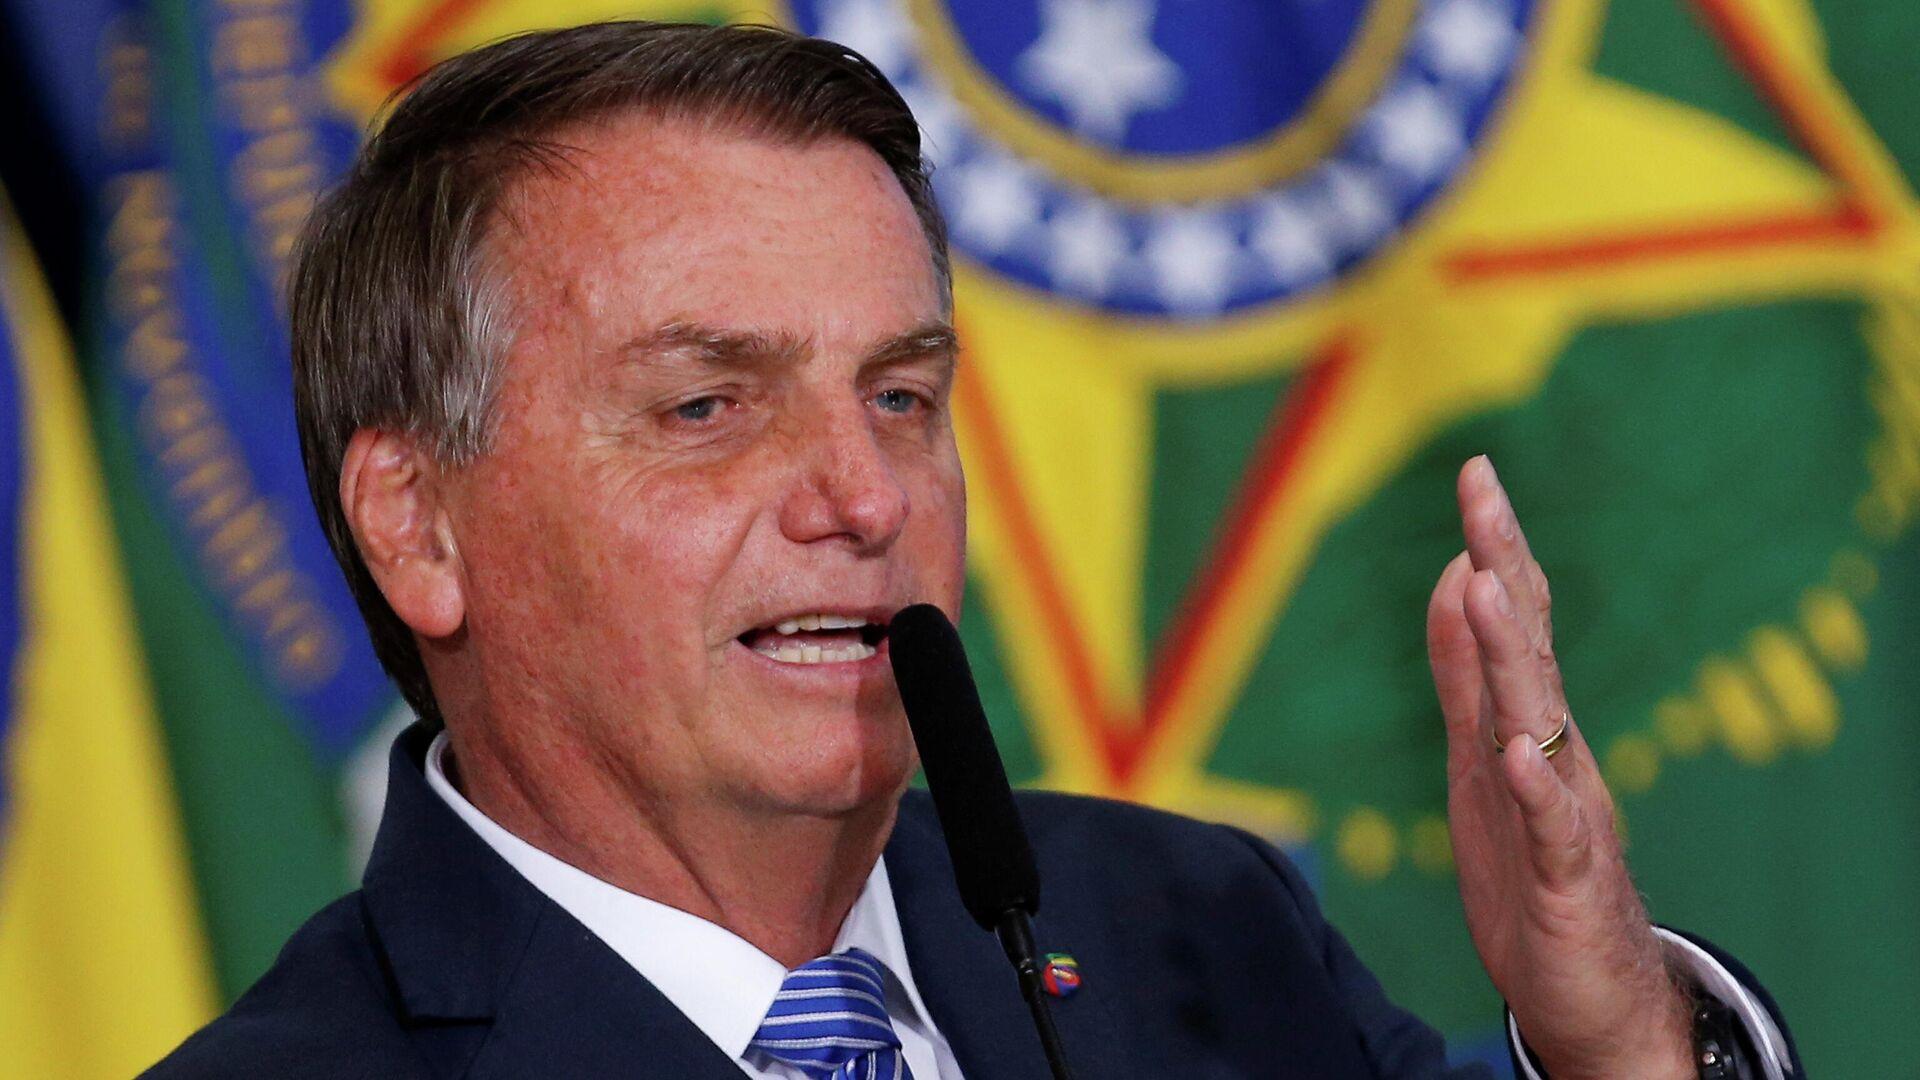 El presidente brasileño, Jair Bolsonaro - Sputnik Mundo, 1920, 09.08.2021